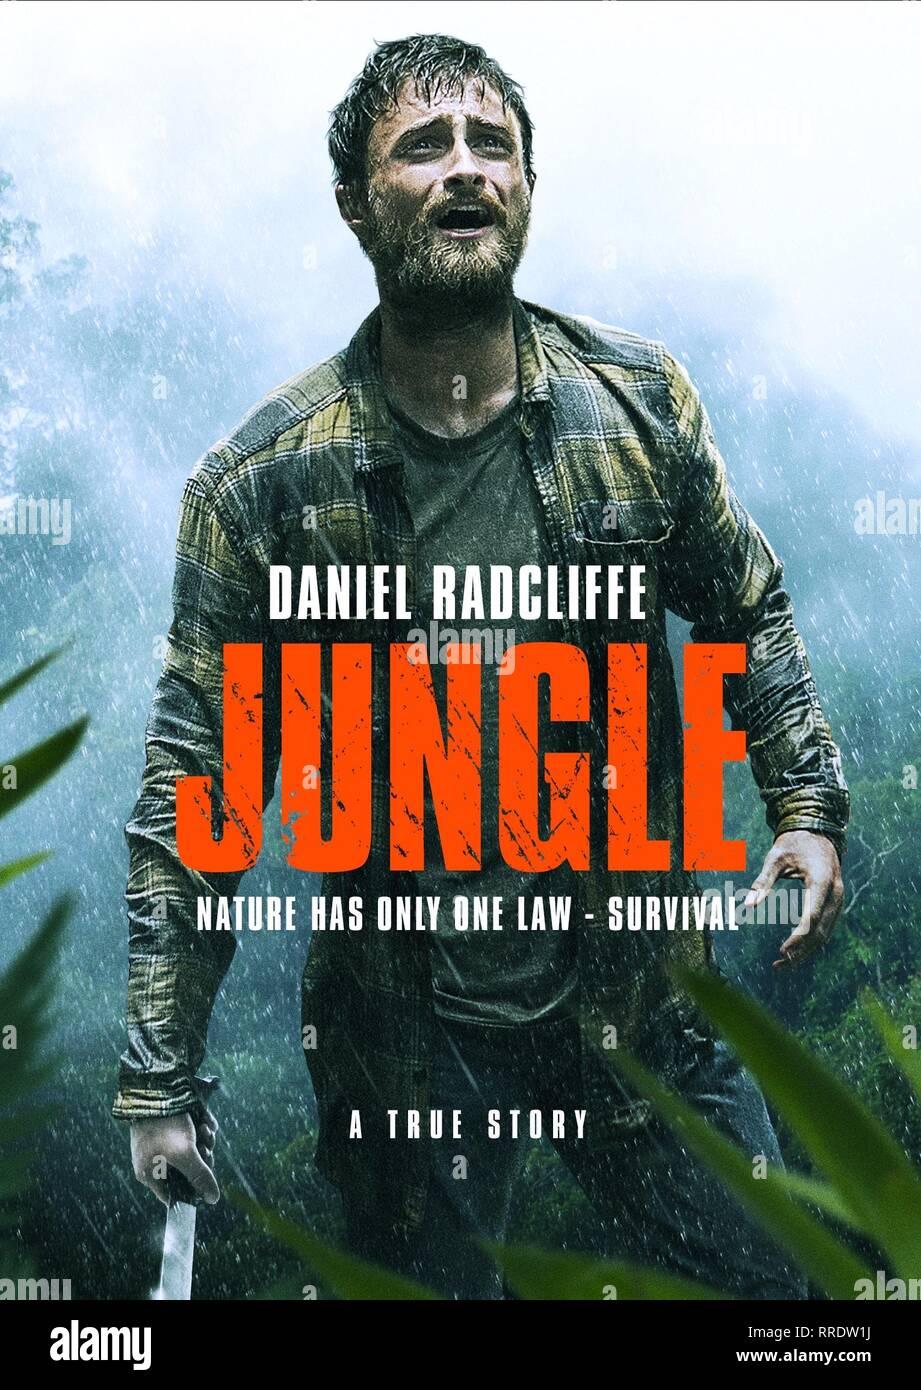 JUNGLE, DANIEL RADCLIFFE POSTER, 2017 - Stock Image